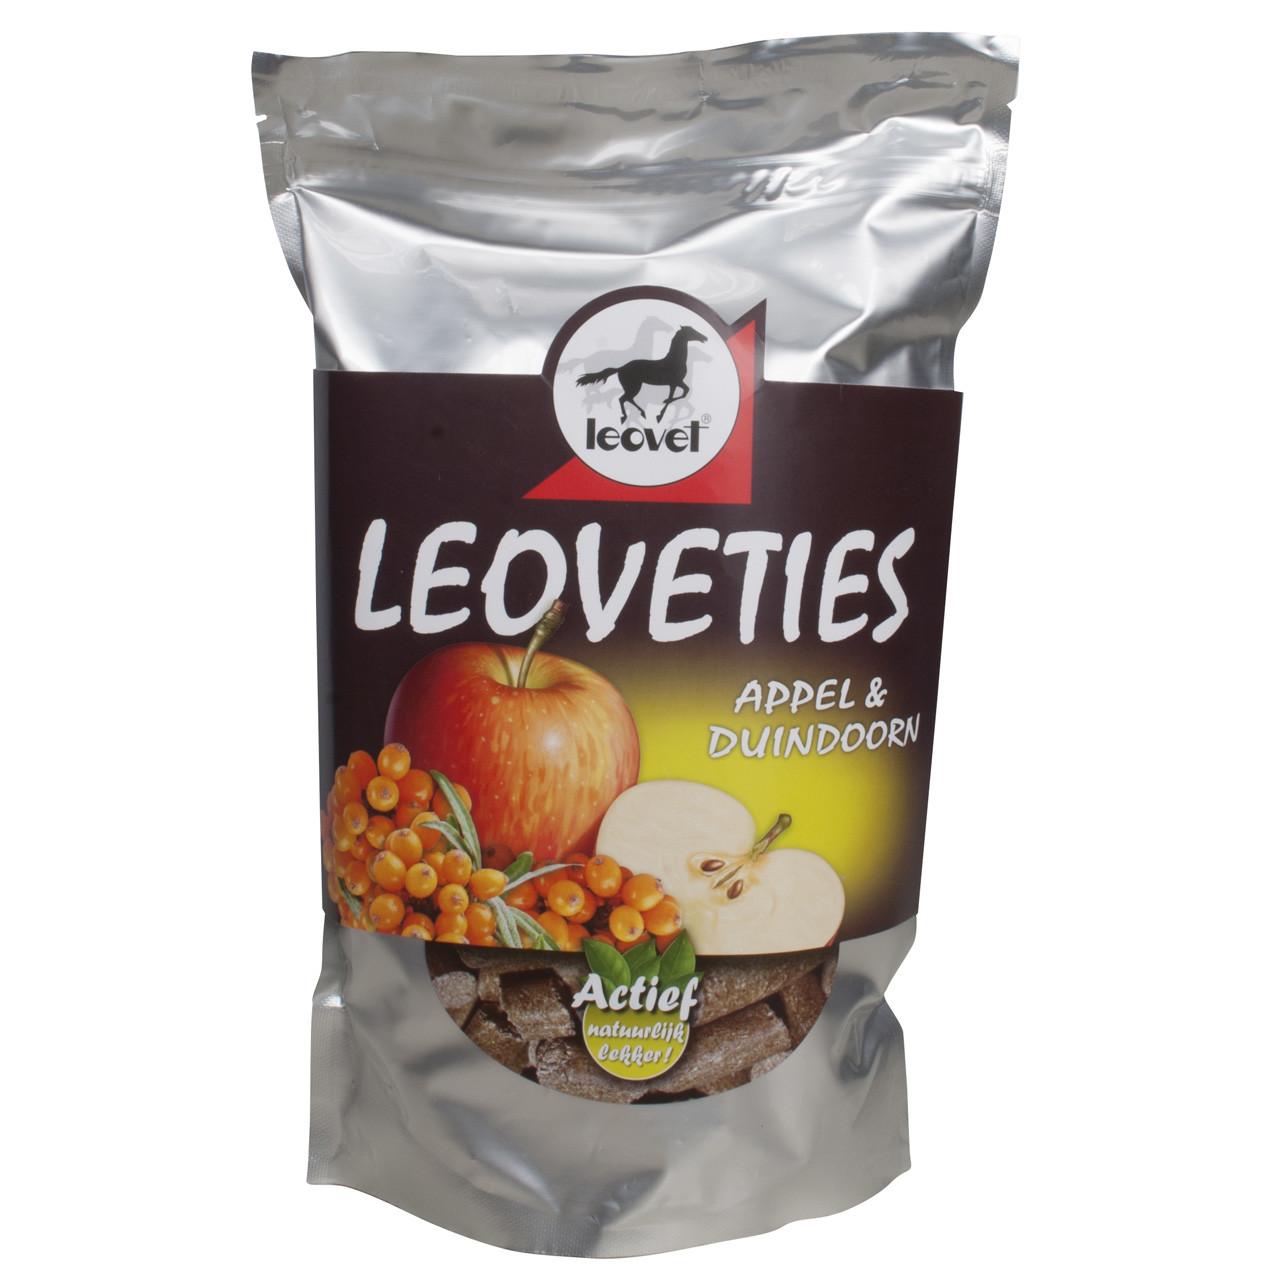 Leoveties Power Mix